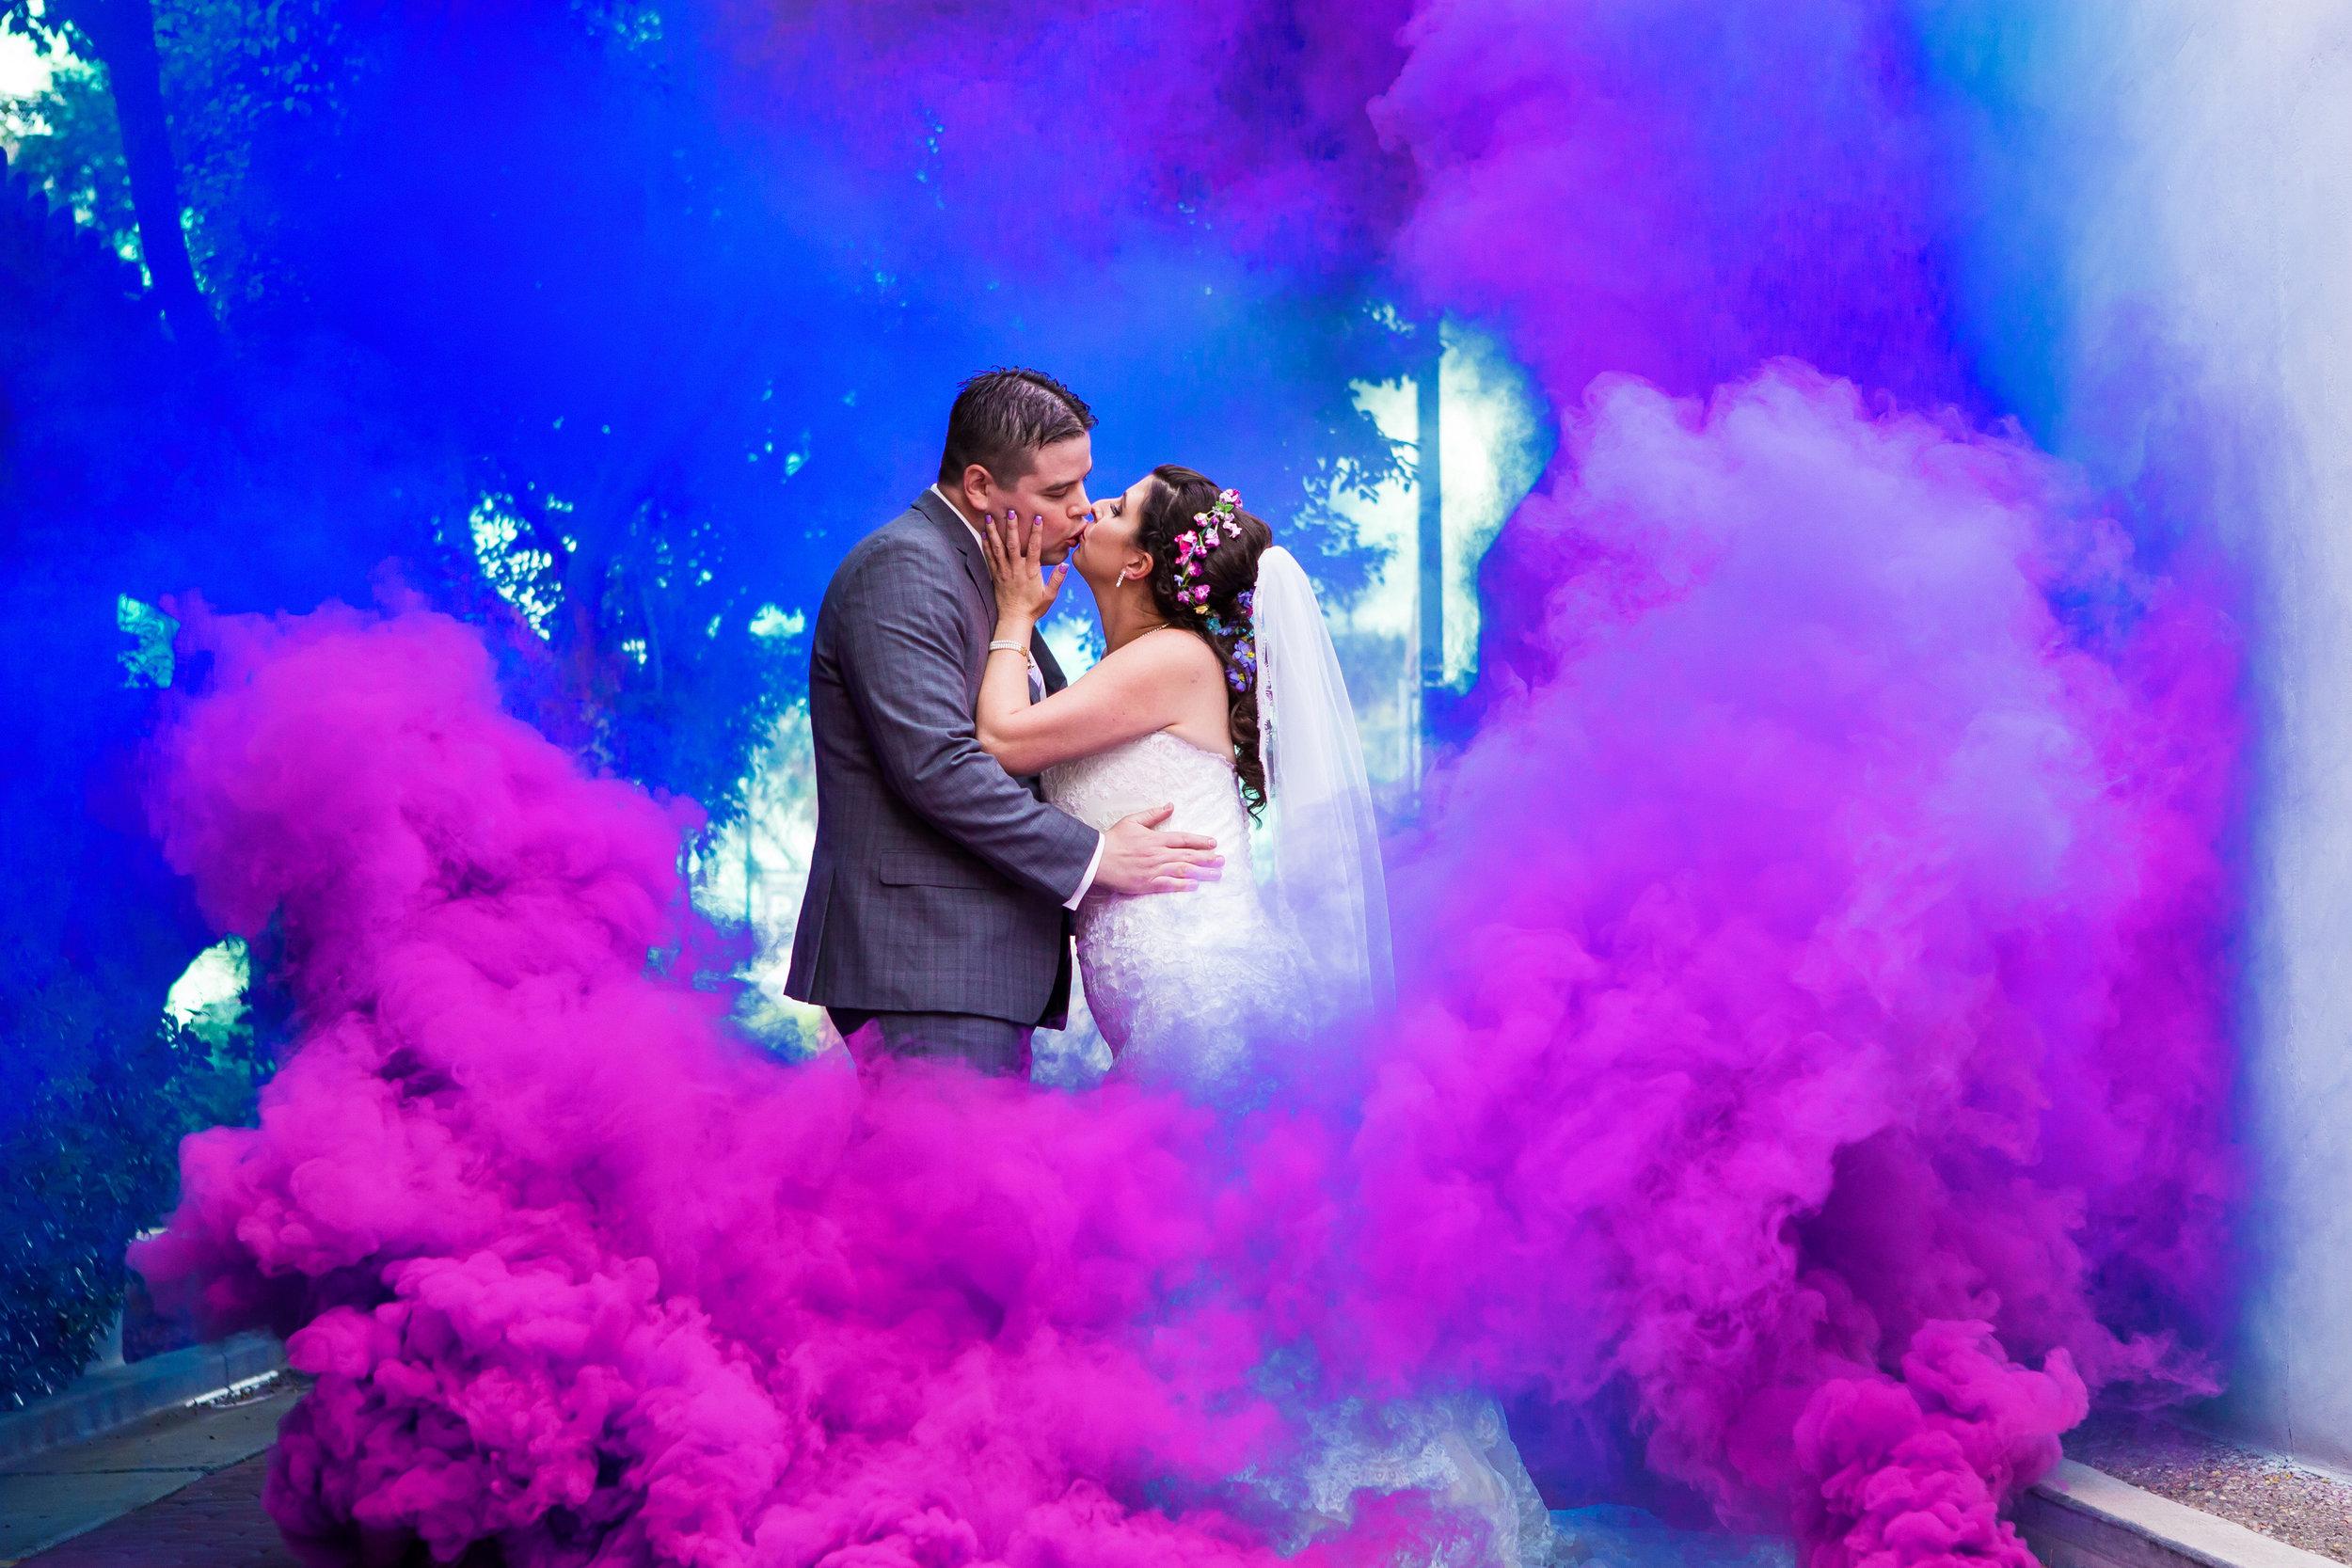 david-orr-photography_wedding-smoke.jpg